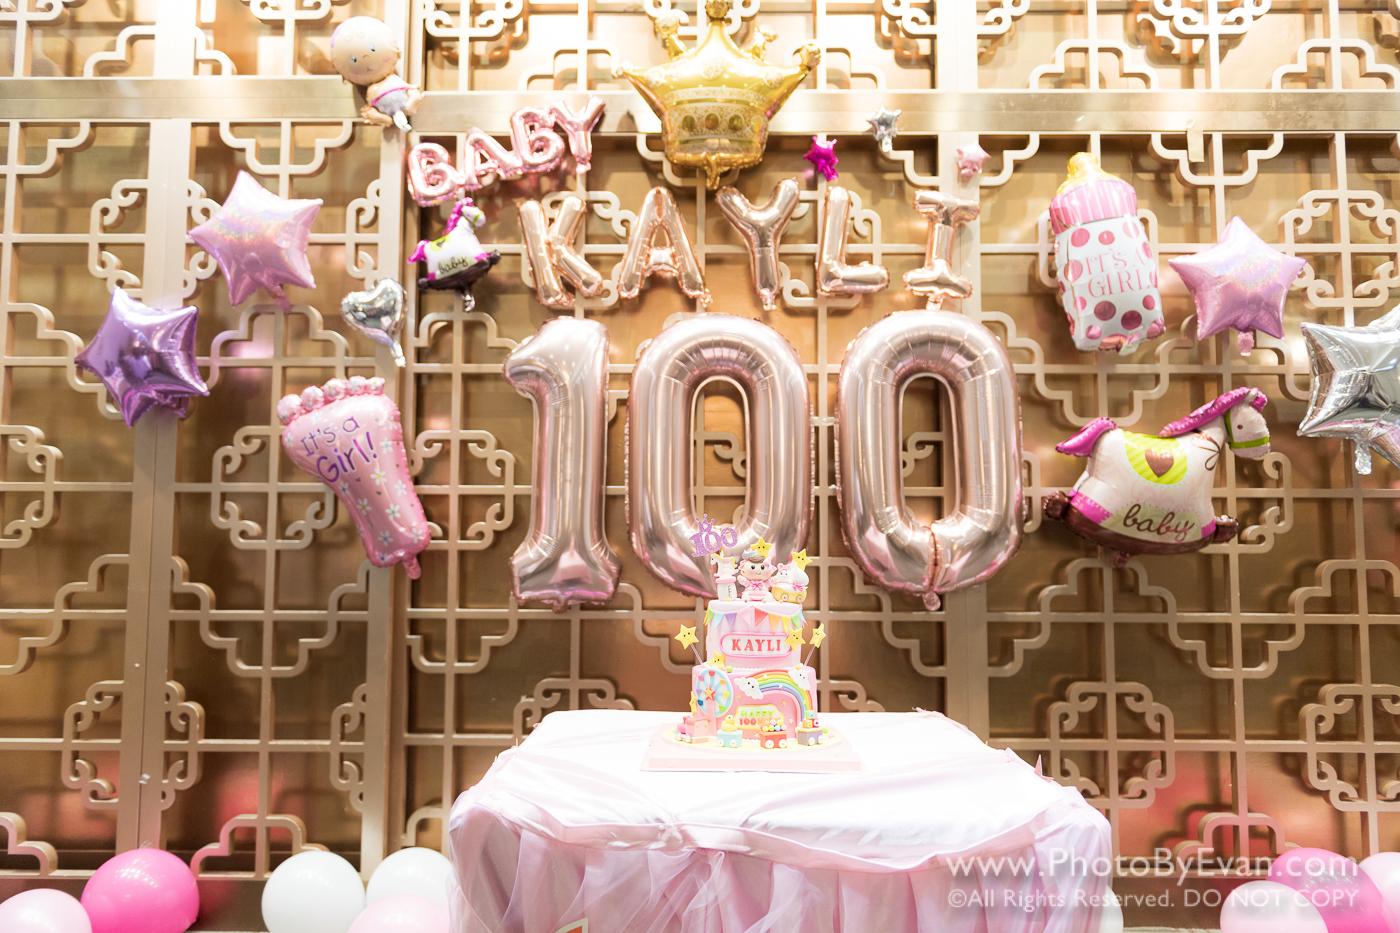 百日宴,百日宴攝影,百日宴影相, 100 days party photography, birthday party, birthday party photography, child party photography, 生日會攝影,活動攝影,生日會,小朋友生日,小朋友生日會